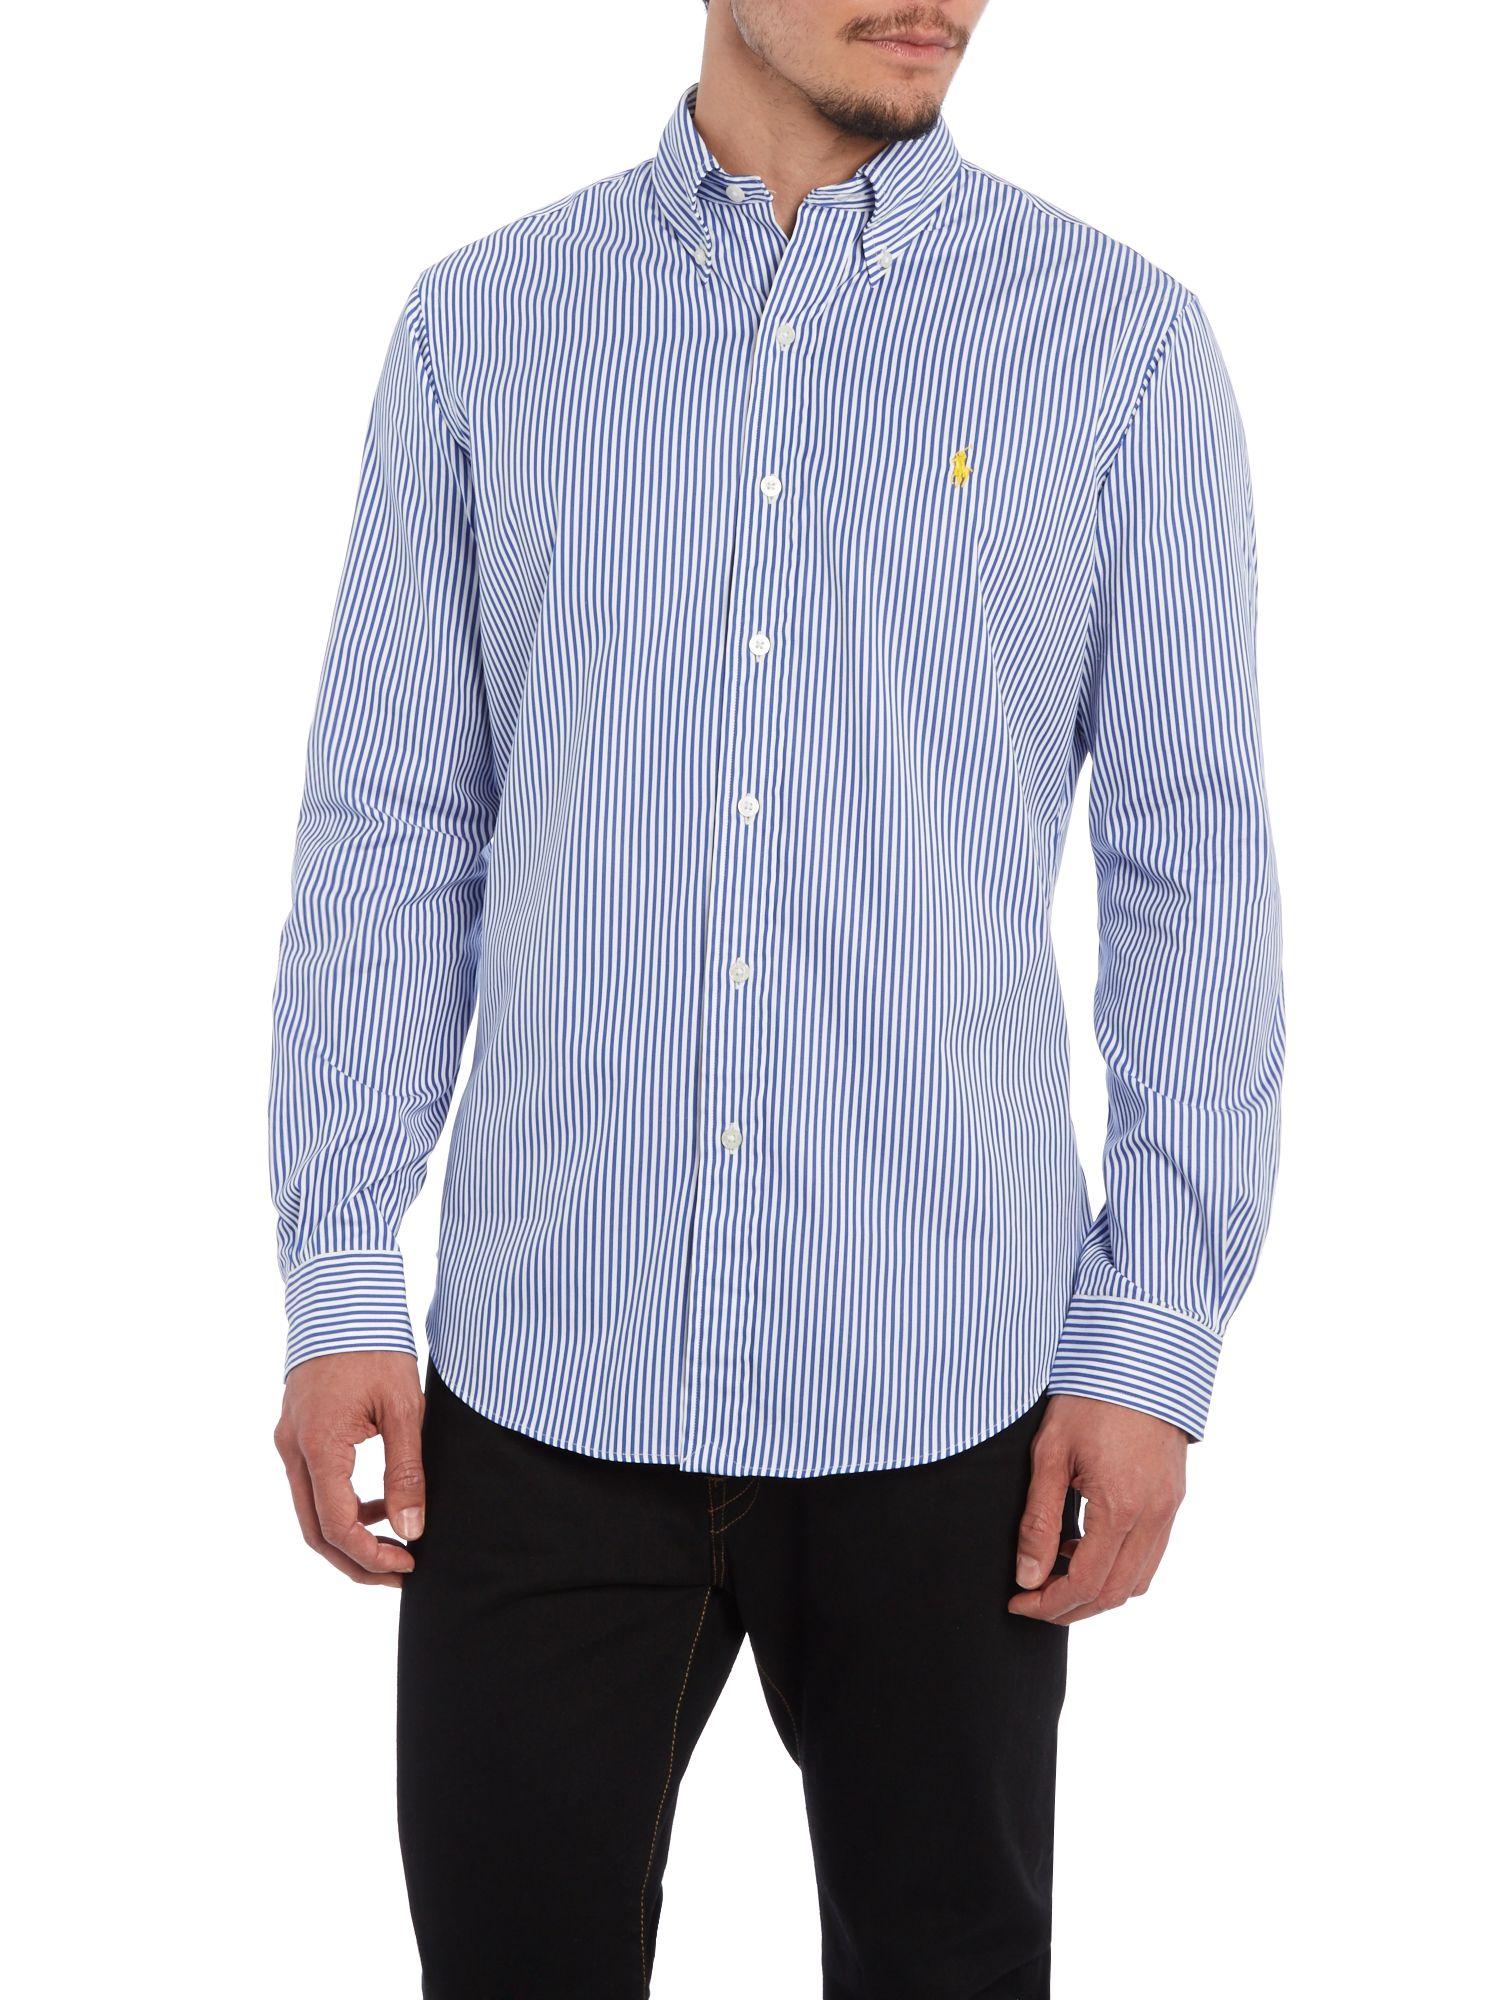 Ralph lauren golf custom fit long sleeve bengal stripe for Custom fit dress shirts